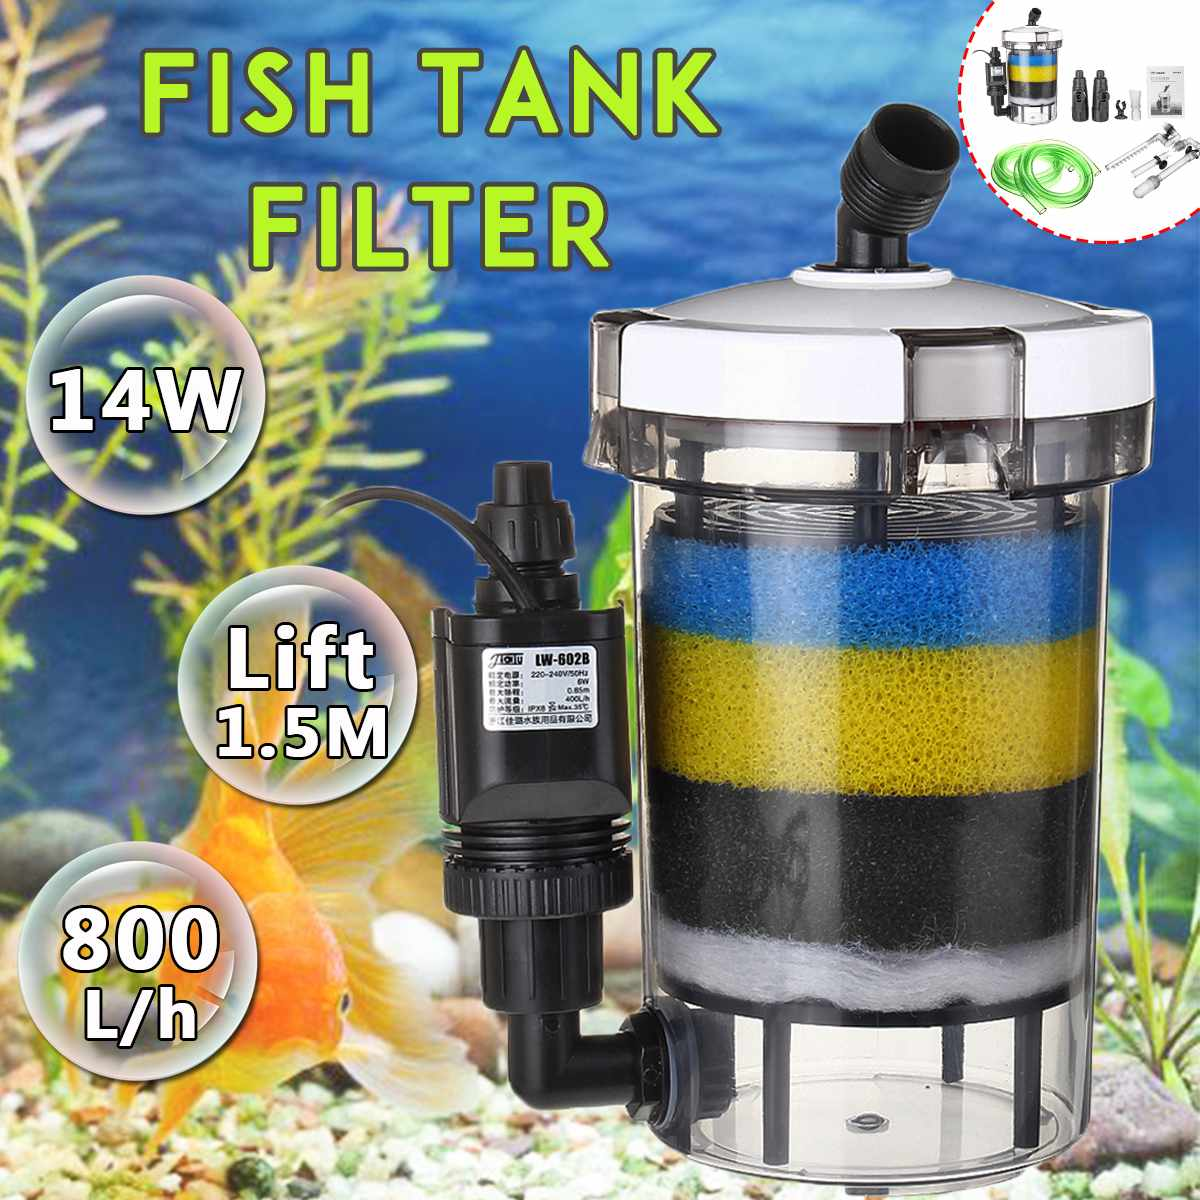 Aquarium Filter Fish Tank Filter Ultra quiet External Aquarium Filter Bucket 220 240V EW 604 EW 604 B Aquarium Sponge Accessory